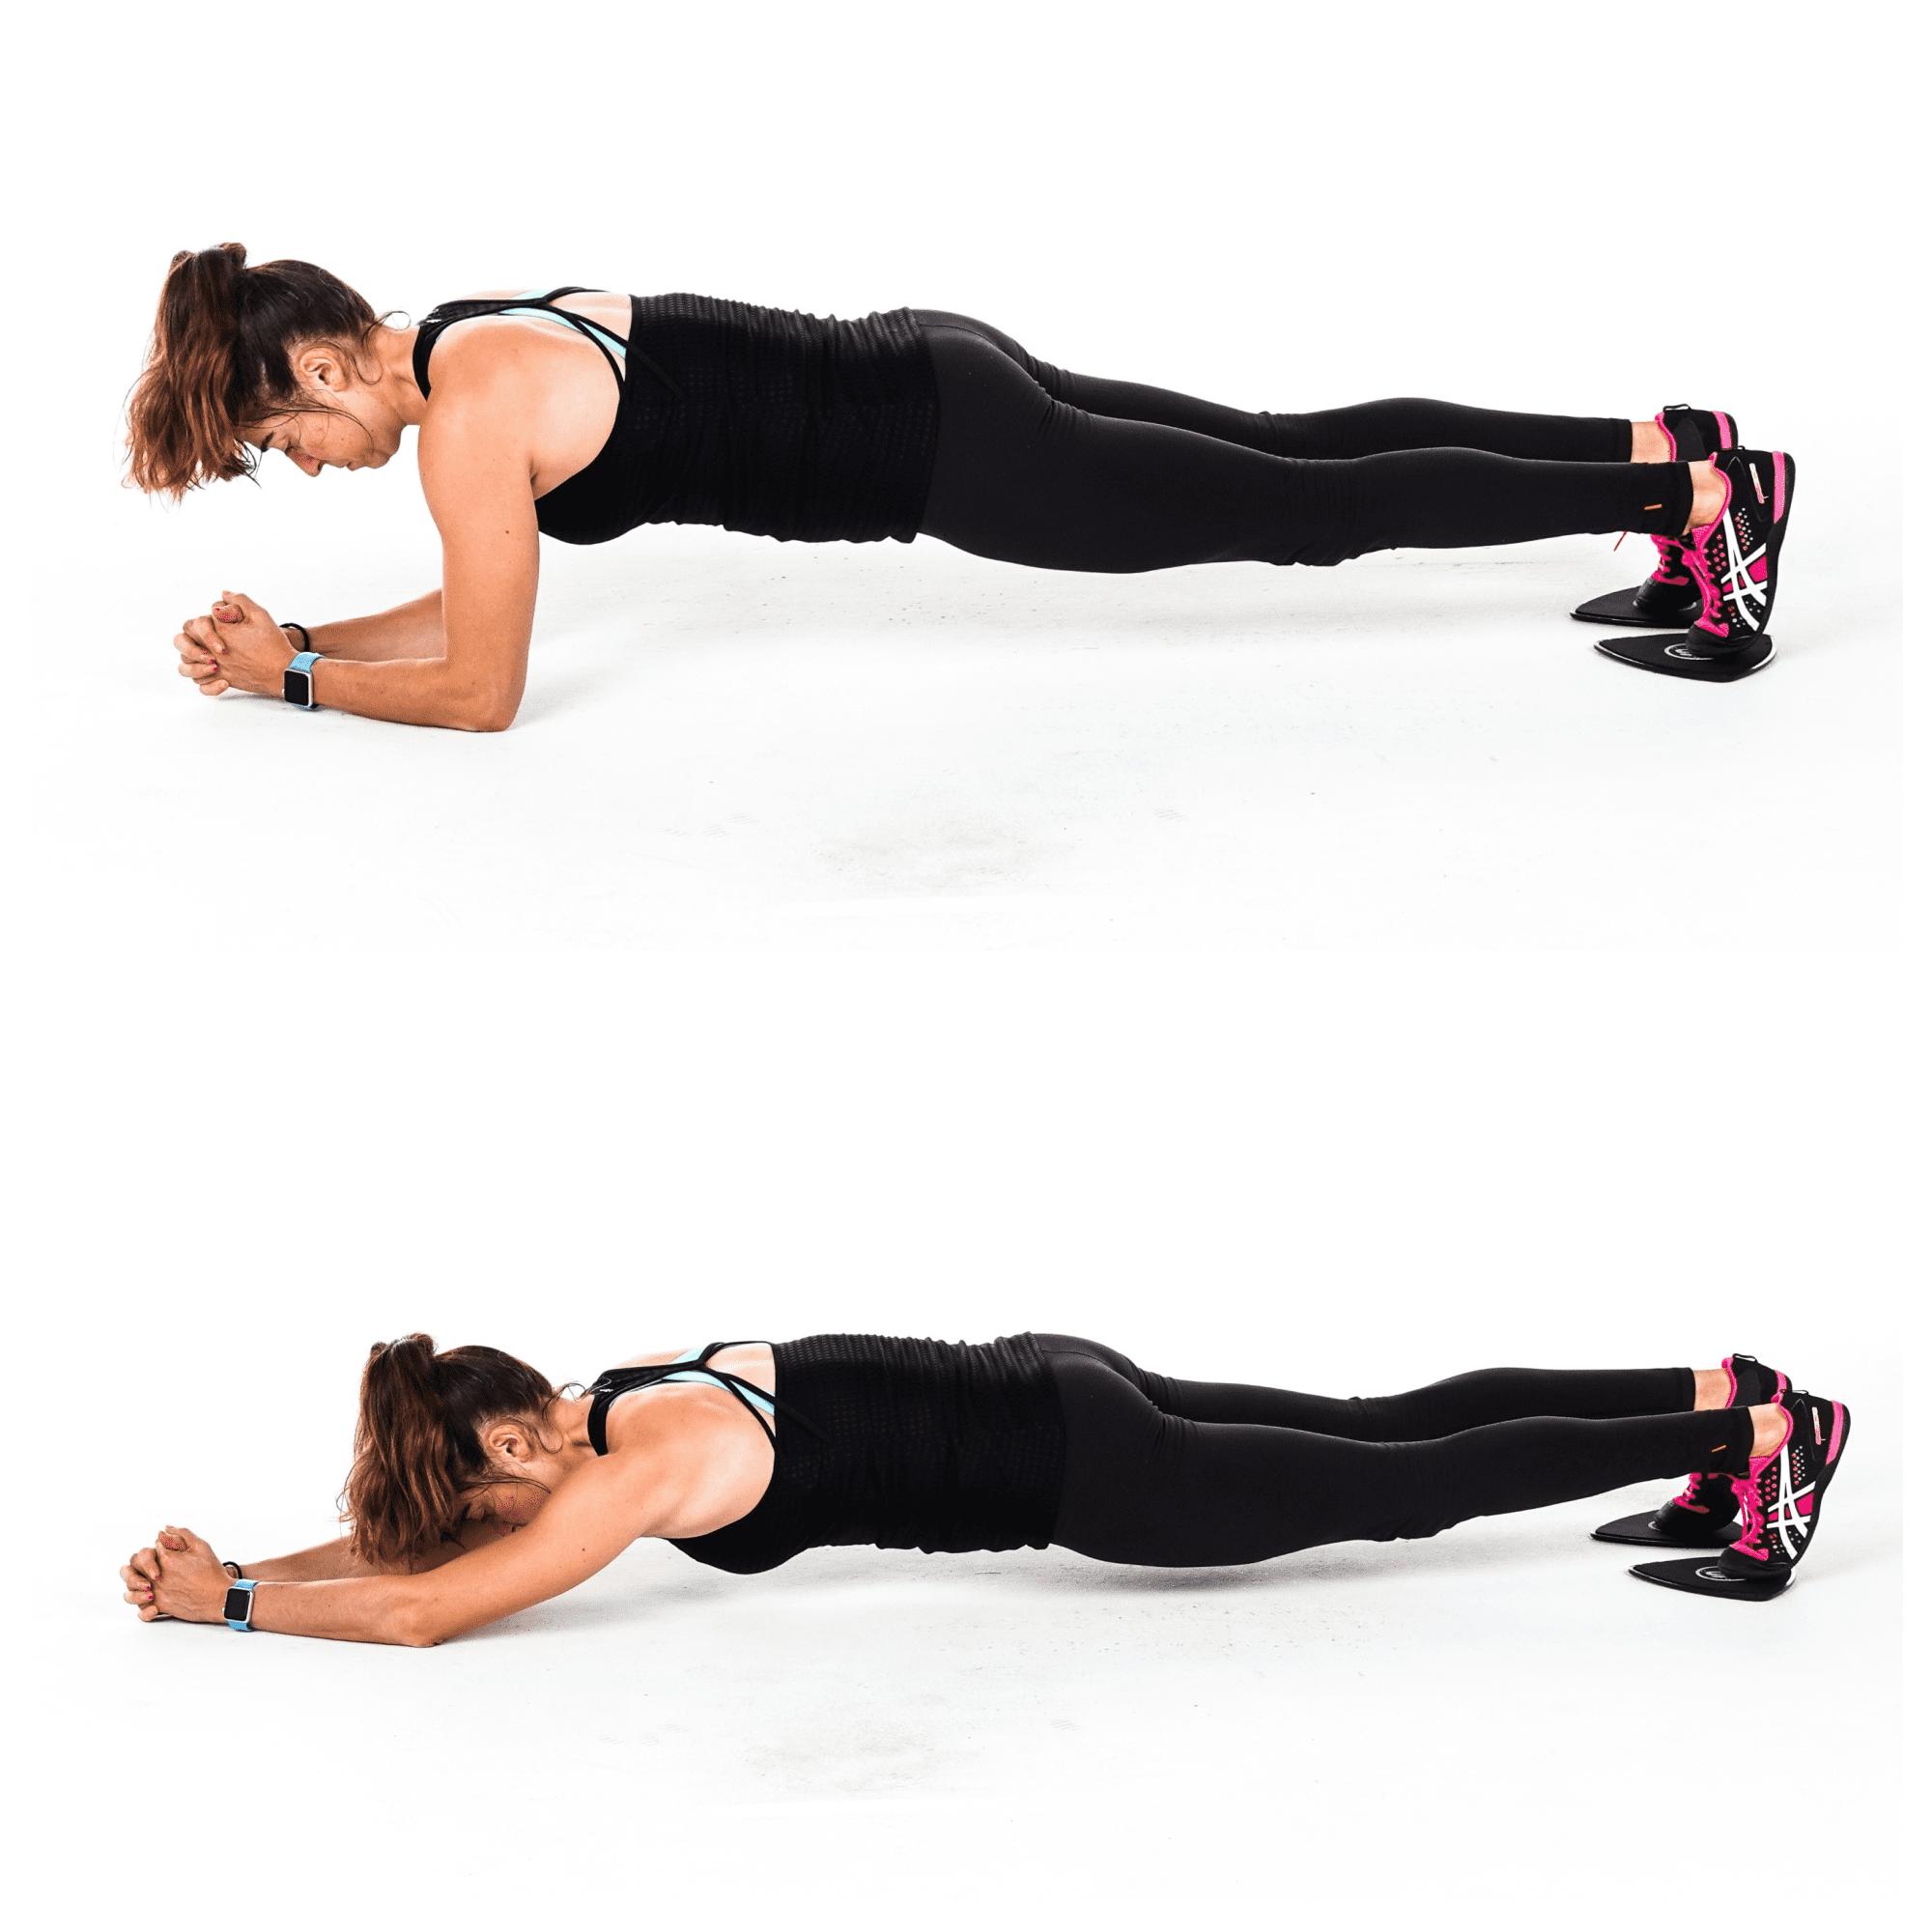 slider body saw plank exercise